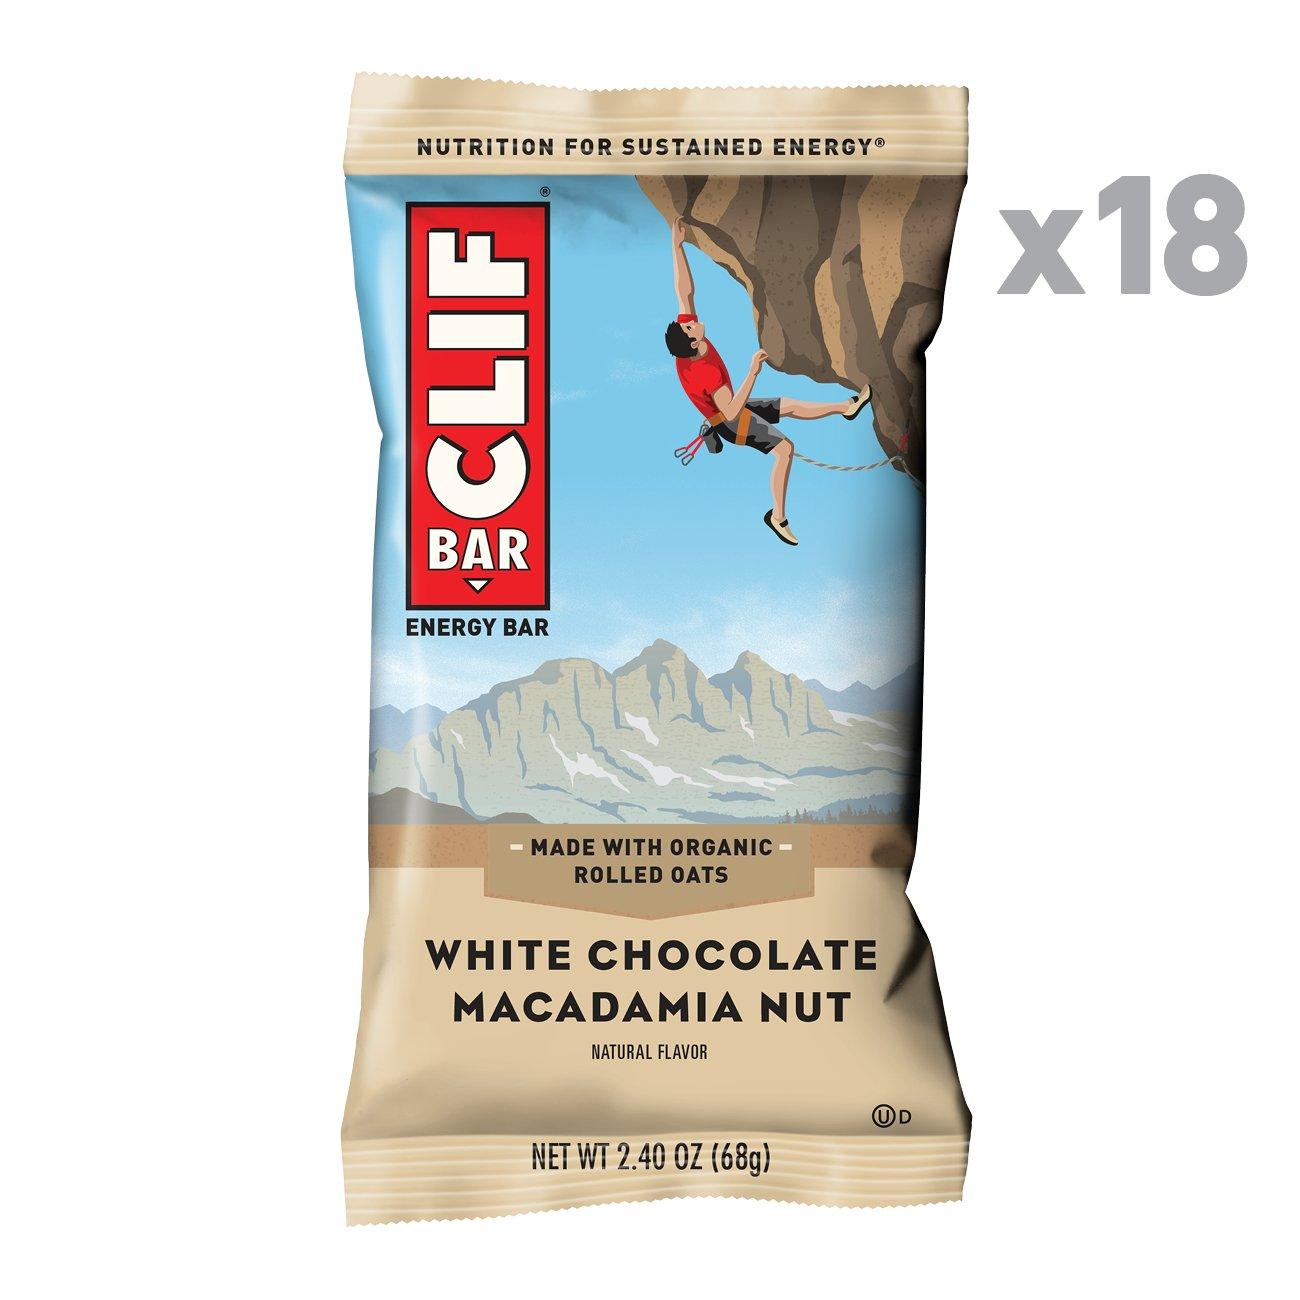 CLIF BAR - Energy Bar - White Chocolate Macadamia Flavor - (2.4 Ounce Protein Bar, 18 Count) by Clif Bar